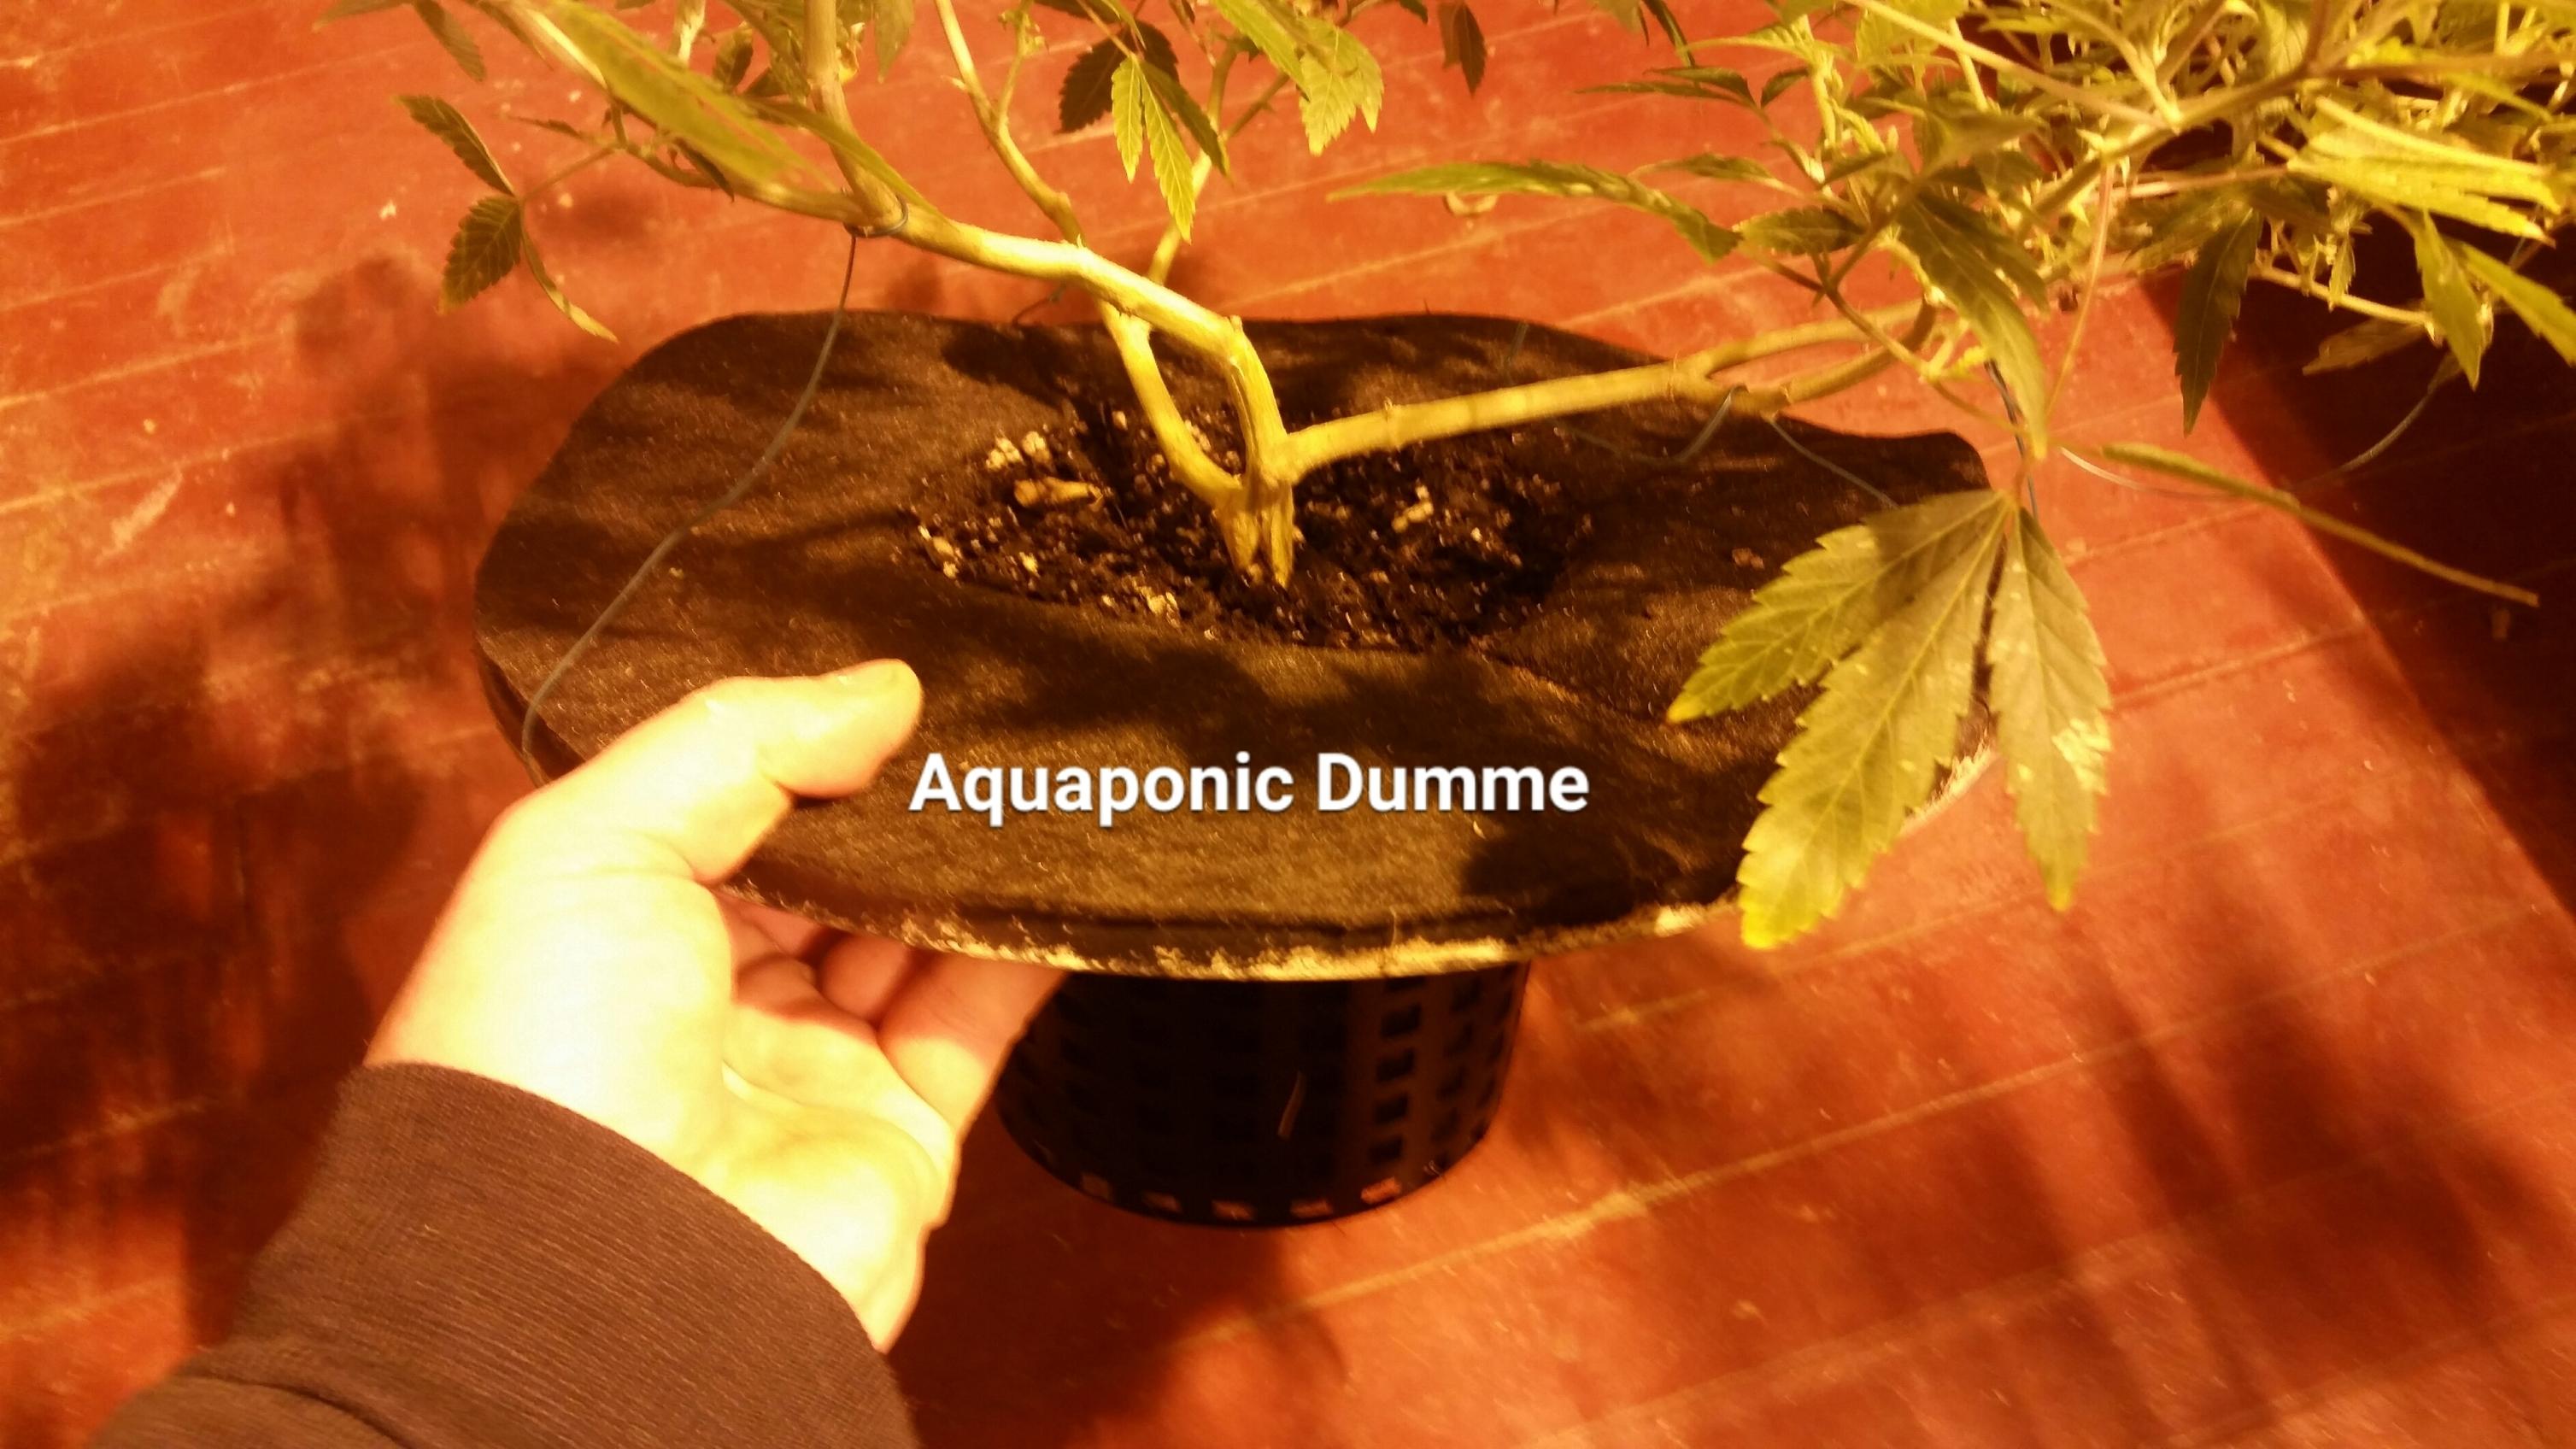 Custom Smartpot of Aeroponic-Soi hybrid